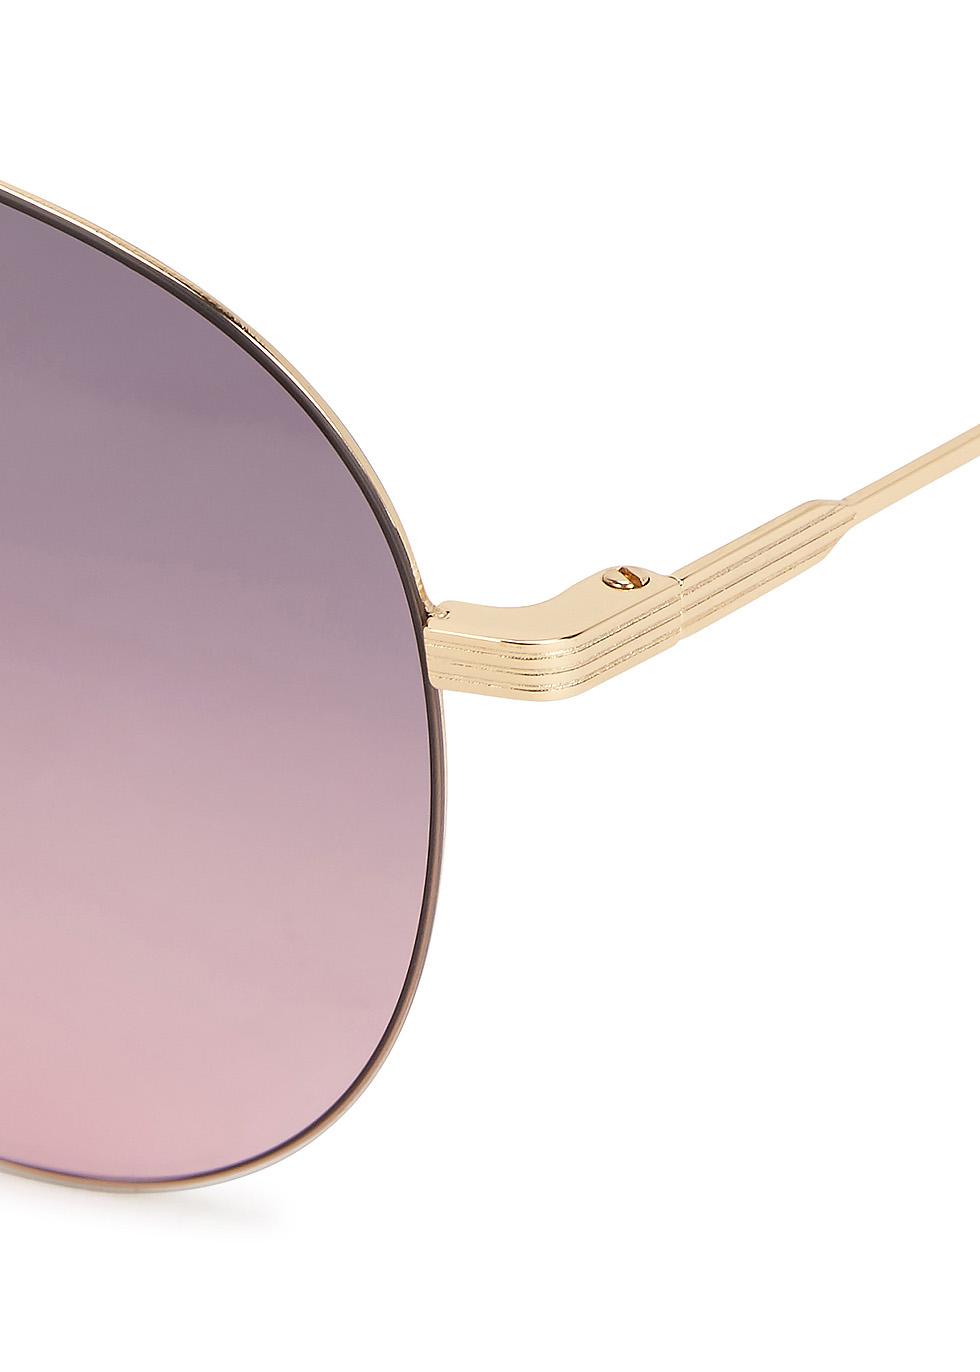 Classic Victoria Feather aviator-style sunglasses - Victoria Beckham